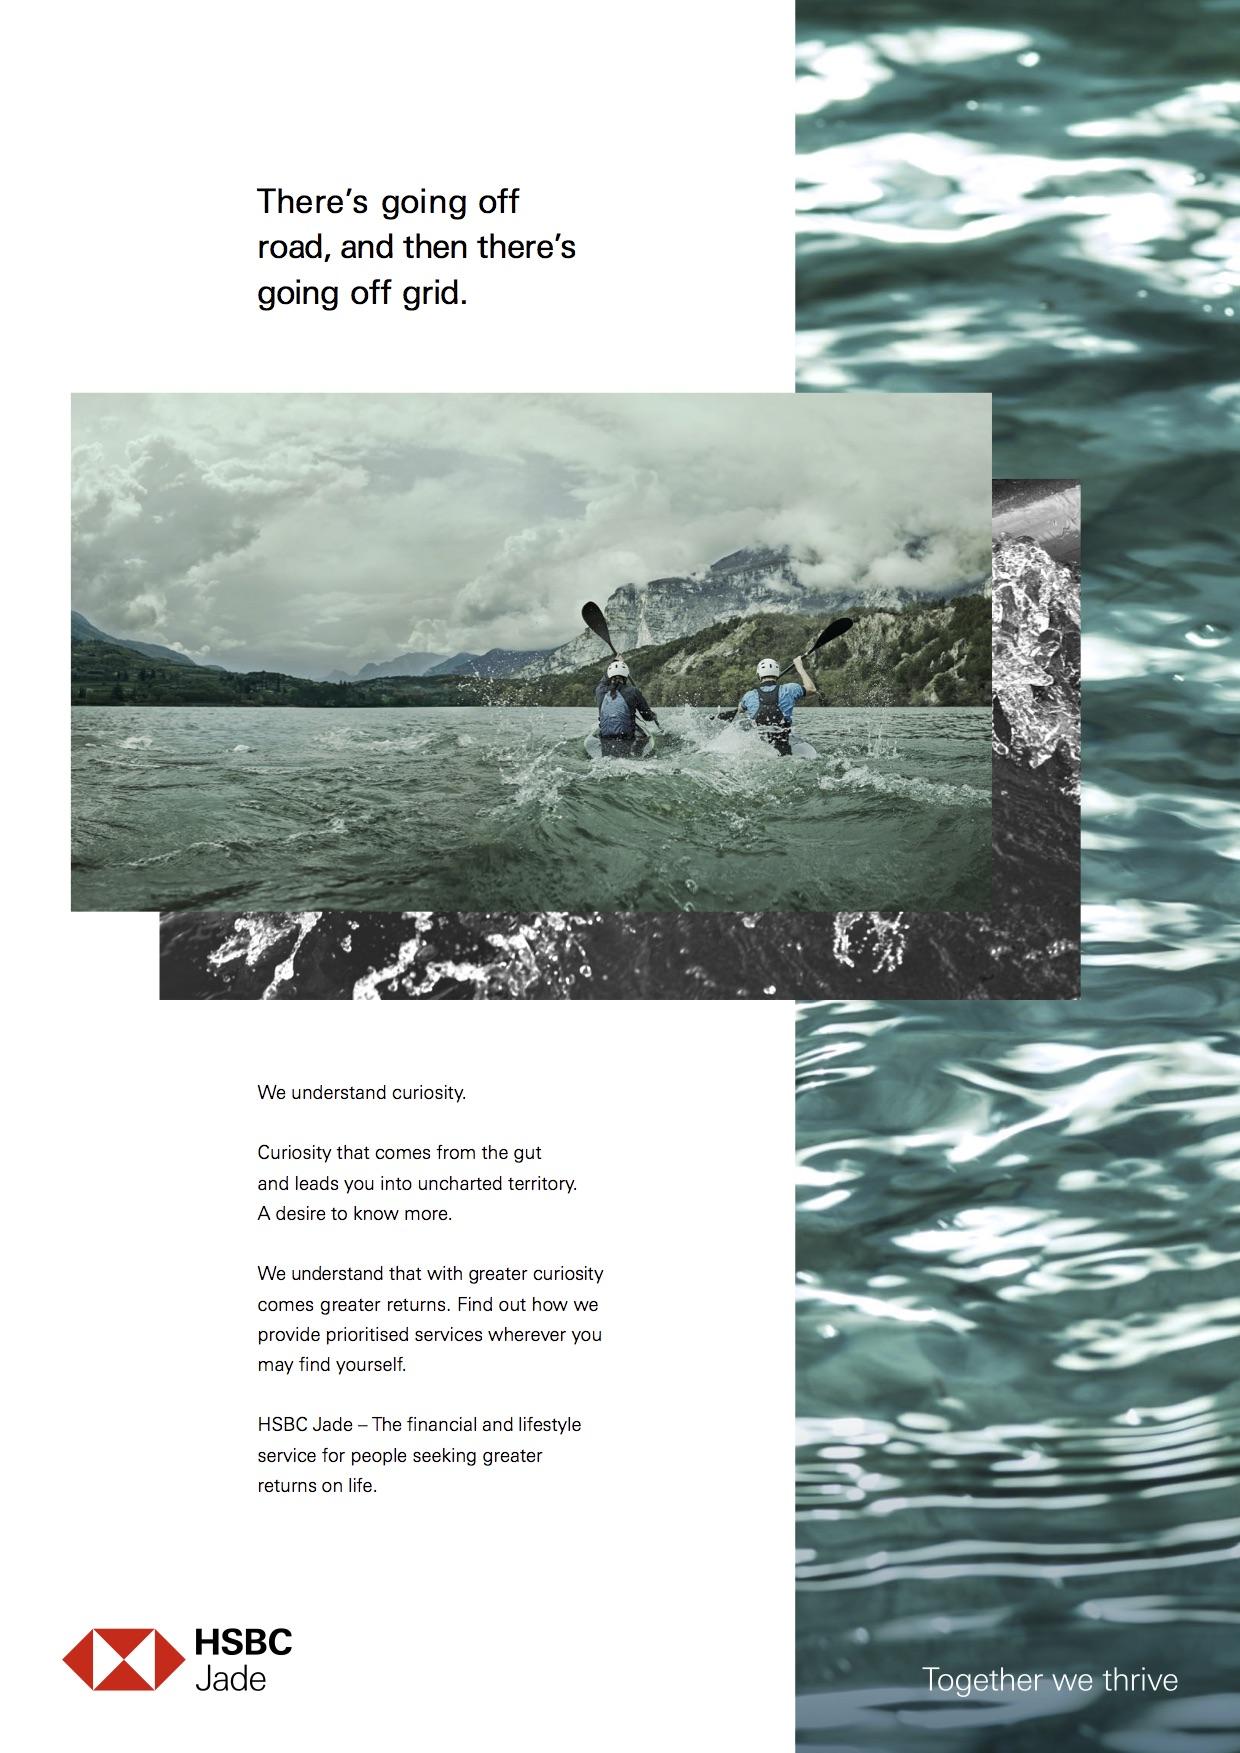 Jade_HSBC_Key MASTER Visual SP_Portrait_Kayaking.jpg